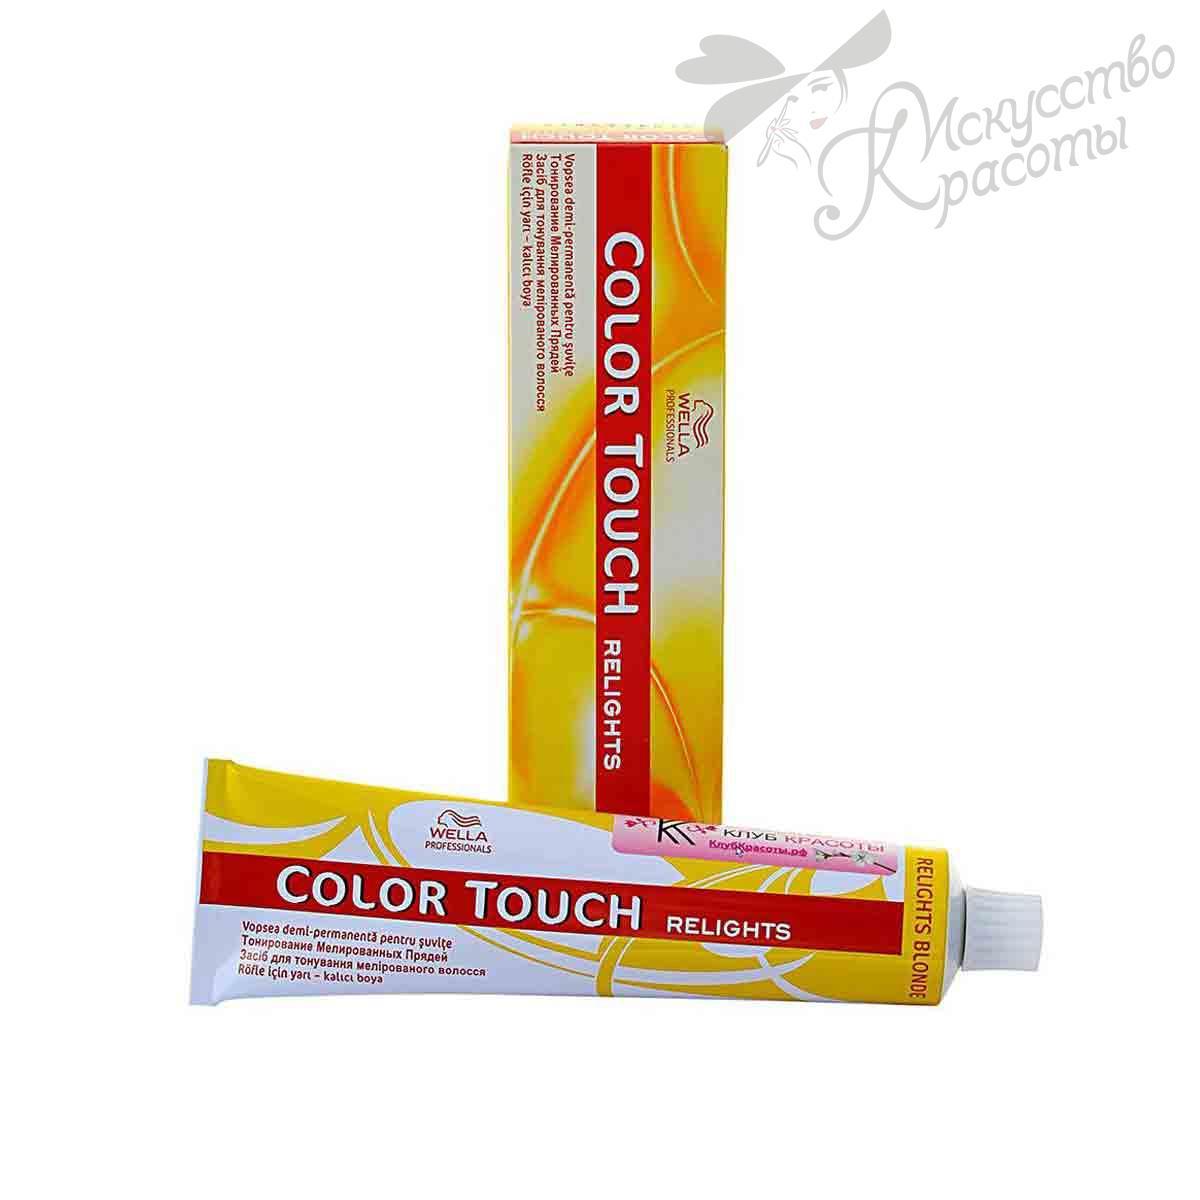 Wella Color Touch Sunlights /36 золотисто-фиолетовый 60 мл